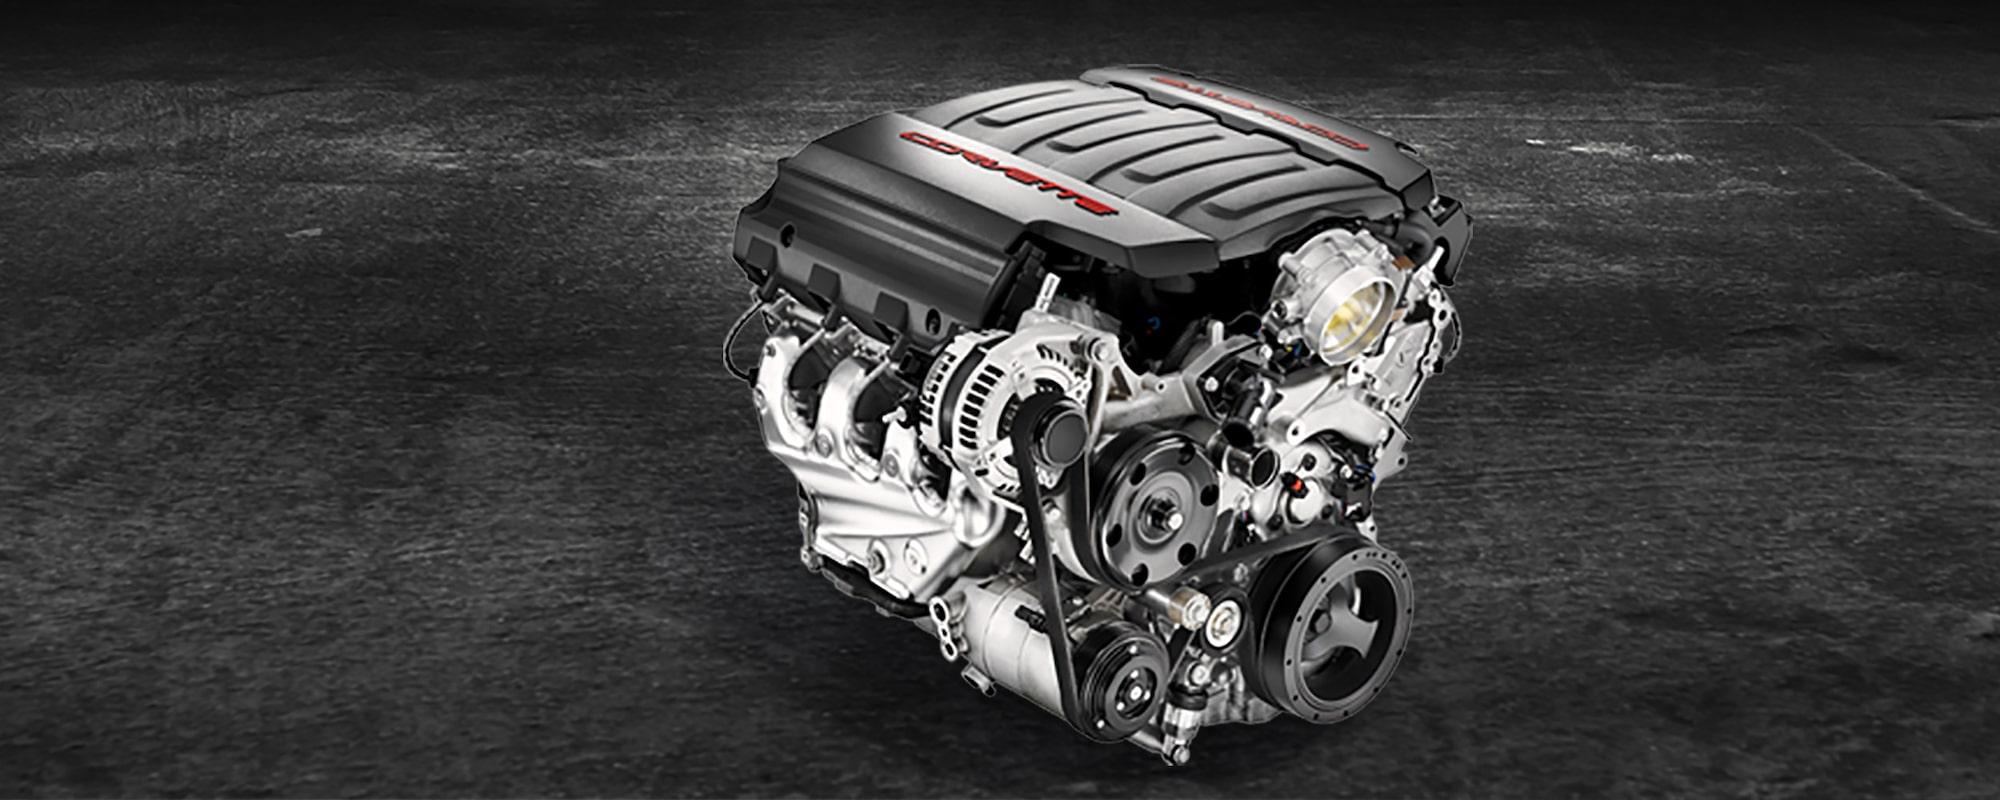 250 Mailin Rebate†1 On All Lt Ls Lsx And Bigblock Chevrolet Performance Crate Engines: GM Lt1 Engine Diagram At Gundyle.co